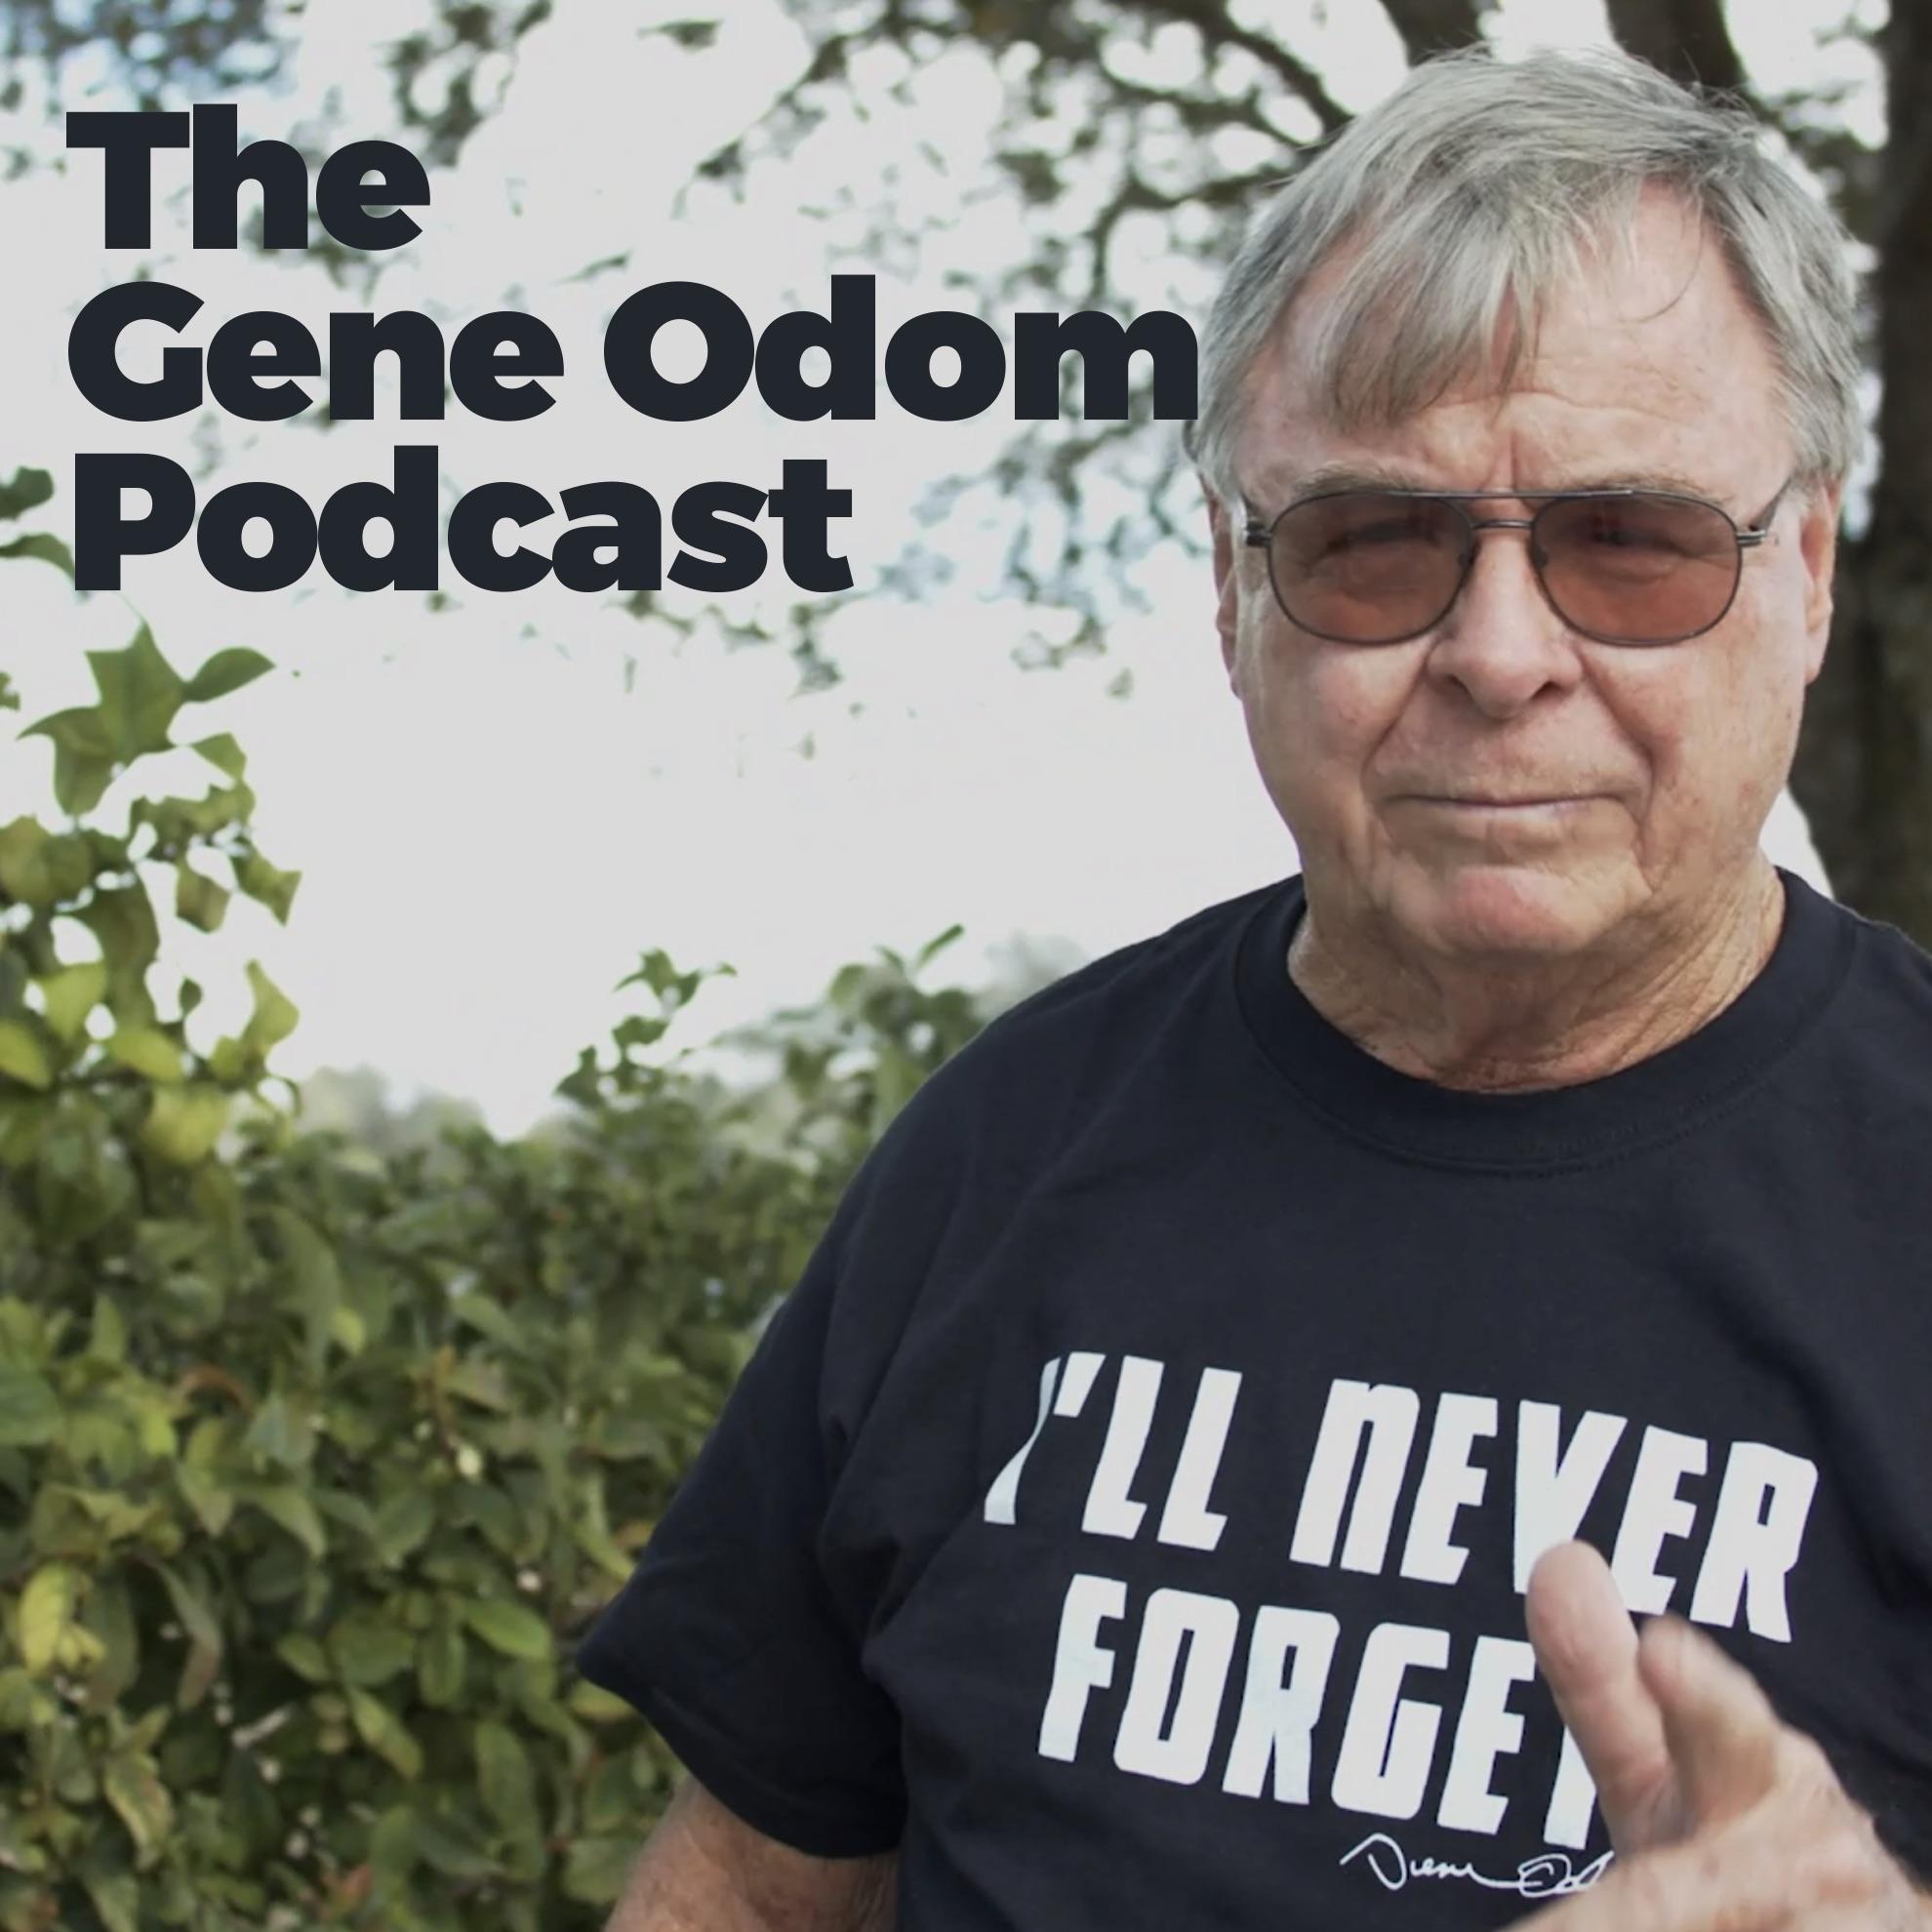 The Gene Odom Podcast